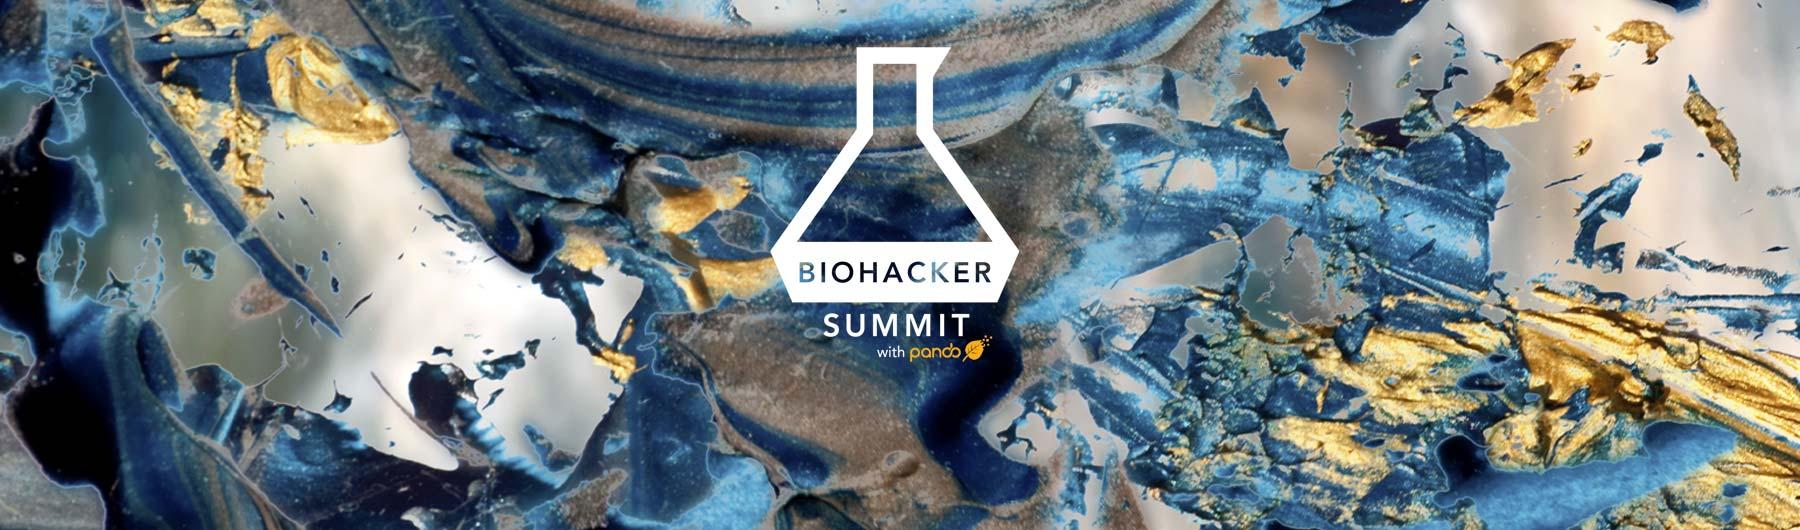 Biohacker Summit UK 2016 with Pando